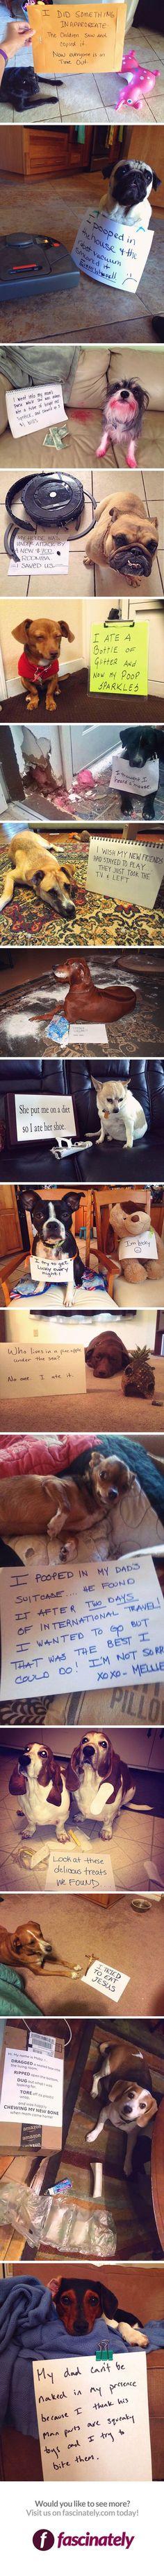 Funny Pets Humor Hilarious Dog Shaming 46 Ideas For 2019 Funny Shit, Funny Cute, Hilarious, Funny Humor, Super Funny, Cats Humor, Dog Humor, Funny Sarcasm, Dog Funnies